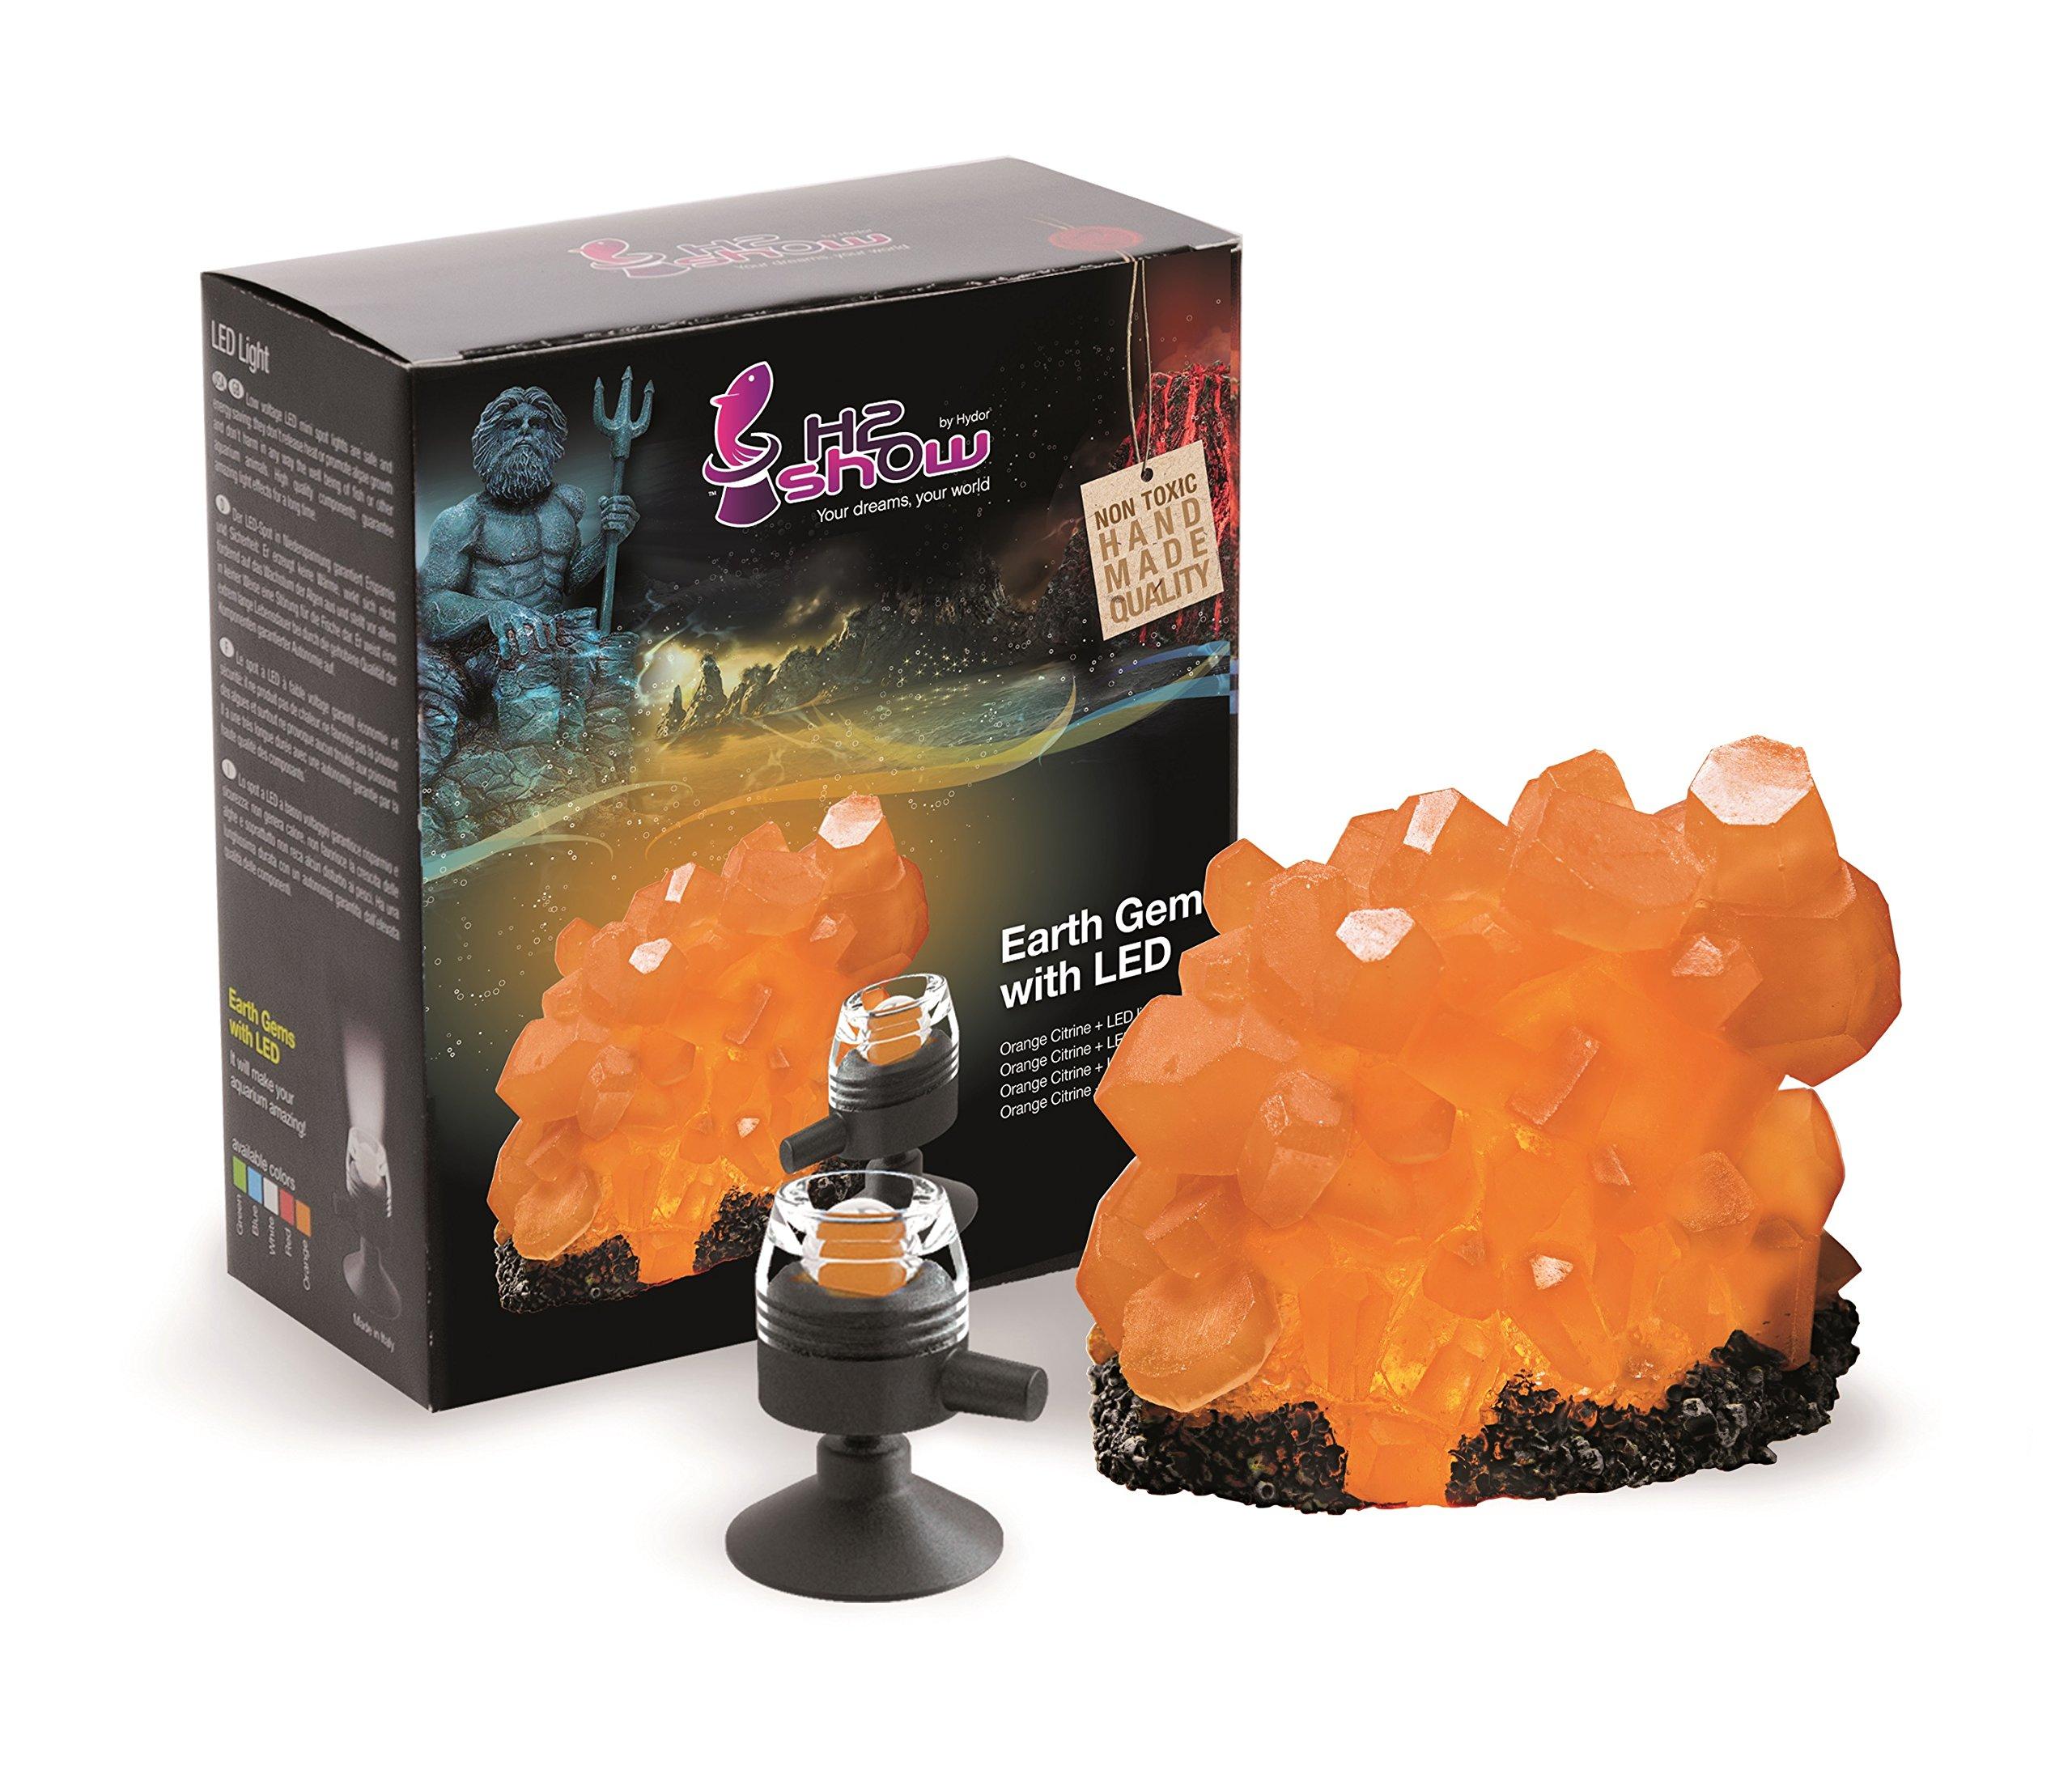 Hydor H2Show Earth Gem, Orange Citrine, Orange LED by Hydor